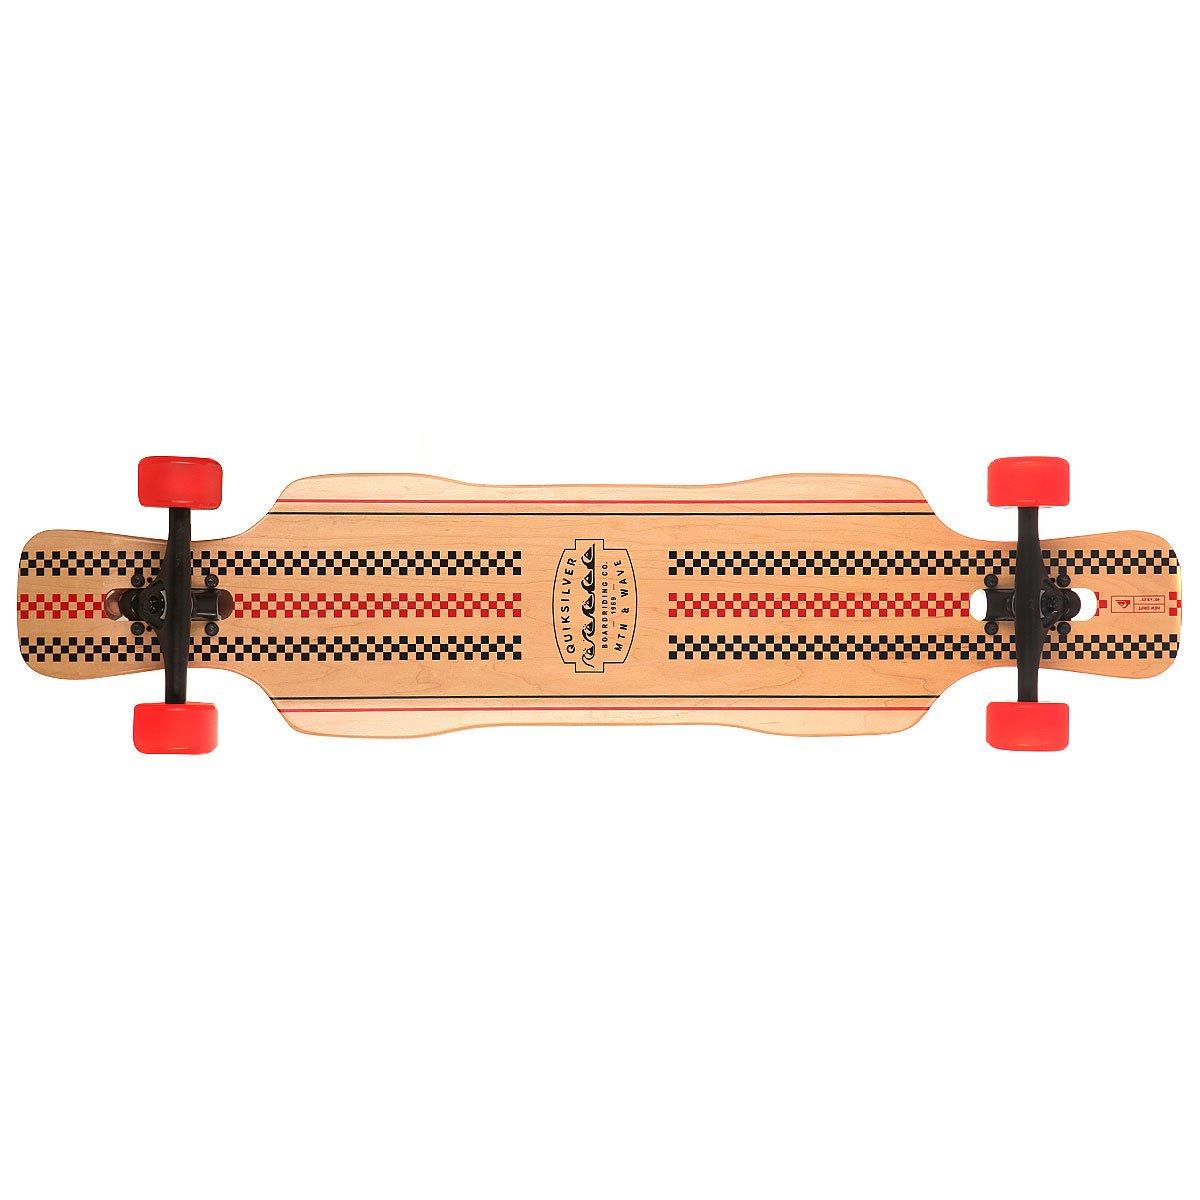 Лонгборд Quiksilver New Drift Multicolour 9.25 x 40 (101.6 см)